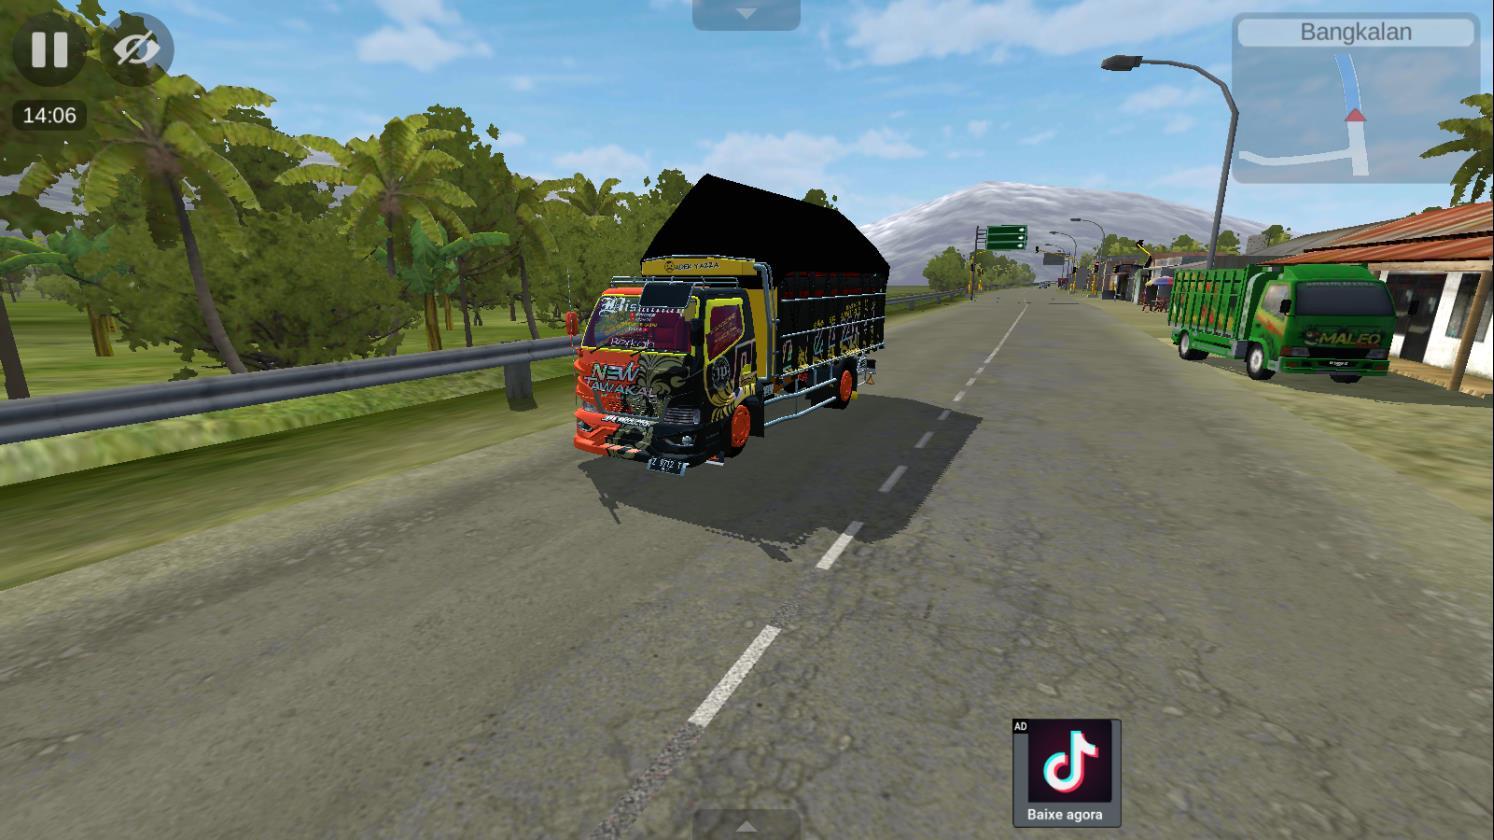 Bus Simulator Indonésia: Mod New Tawakal 4